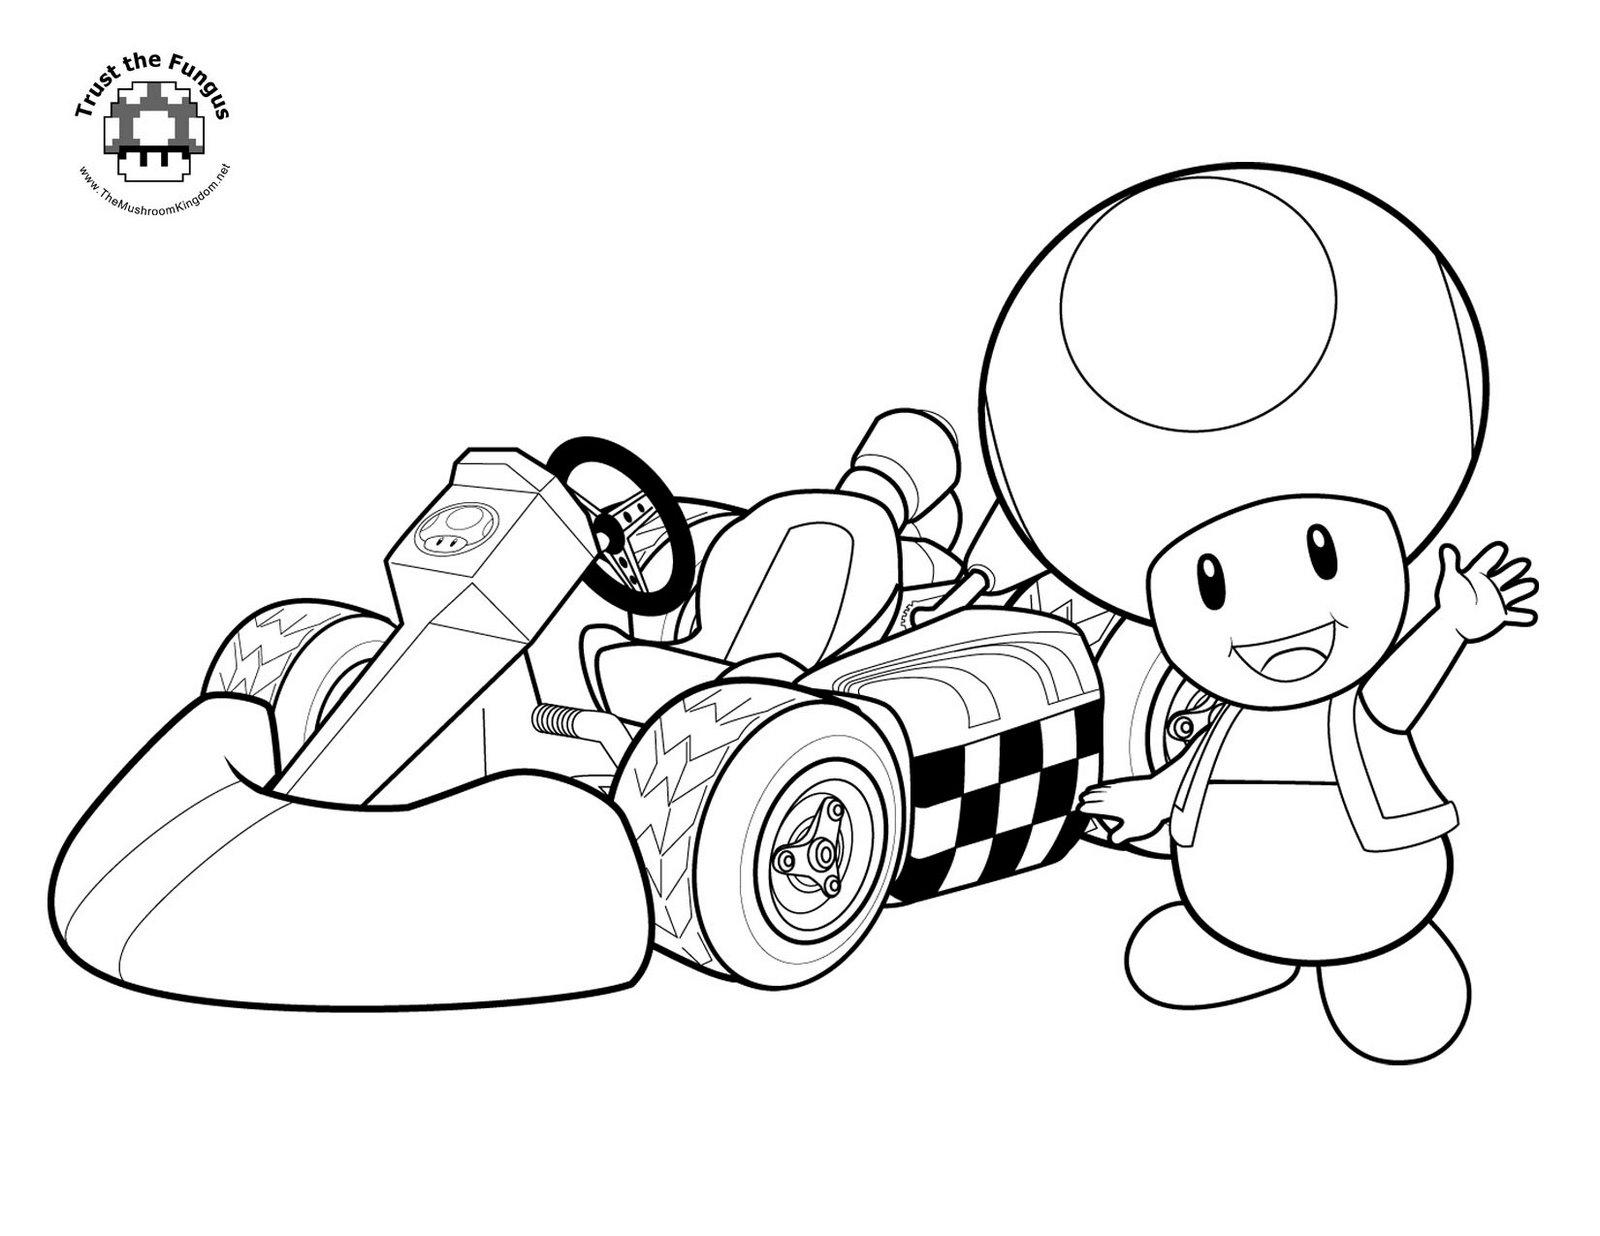 Coloriage Toad Mario Kart À Imprimer concernant Coloriage Mario Kart